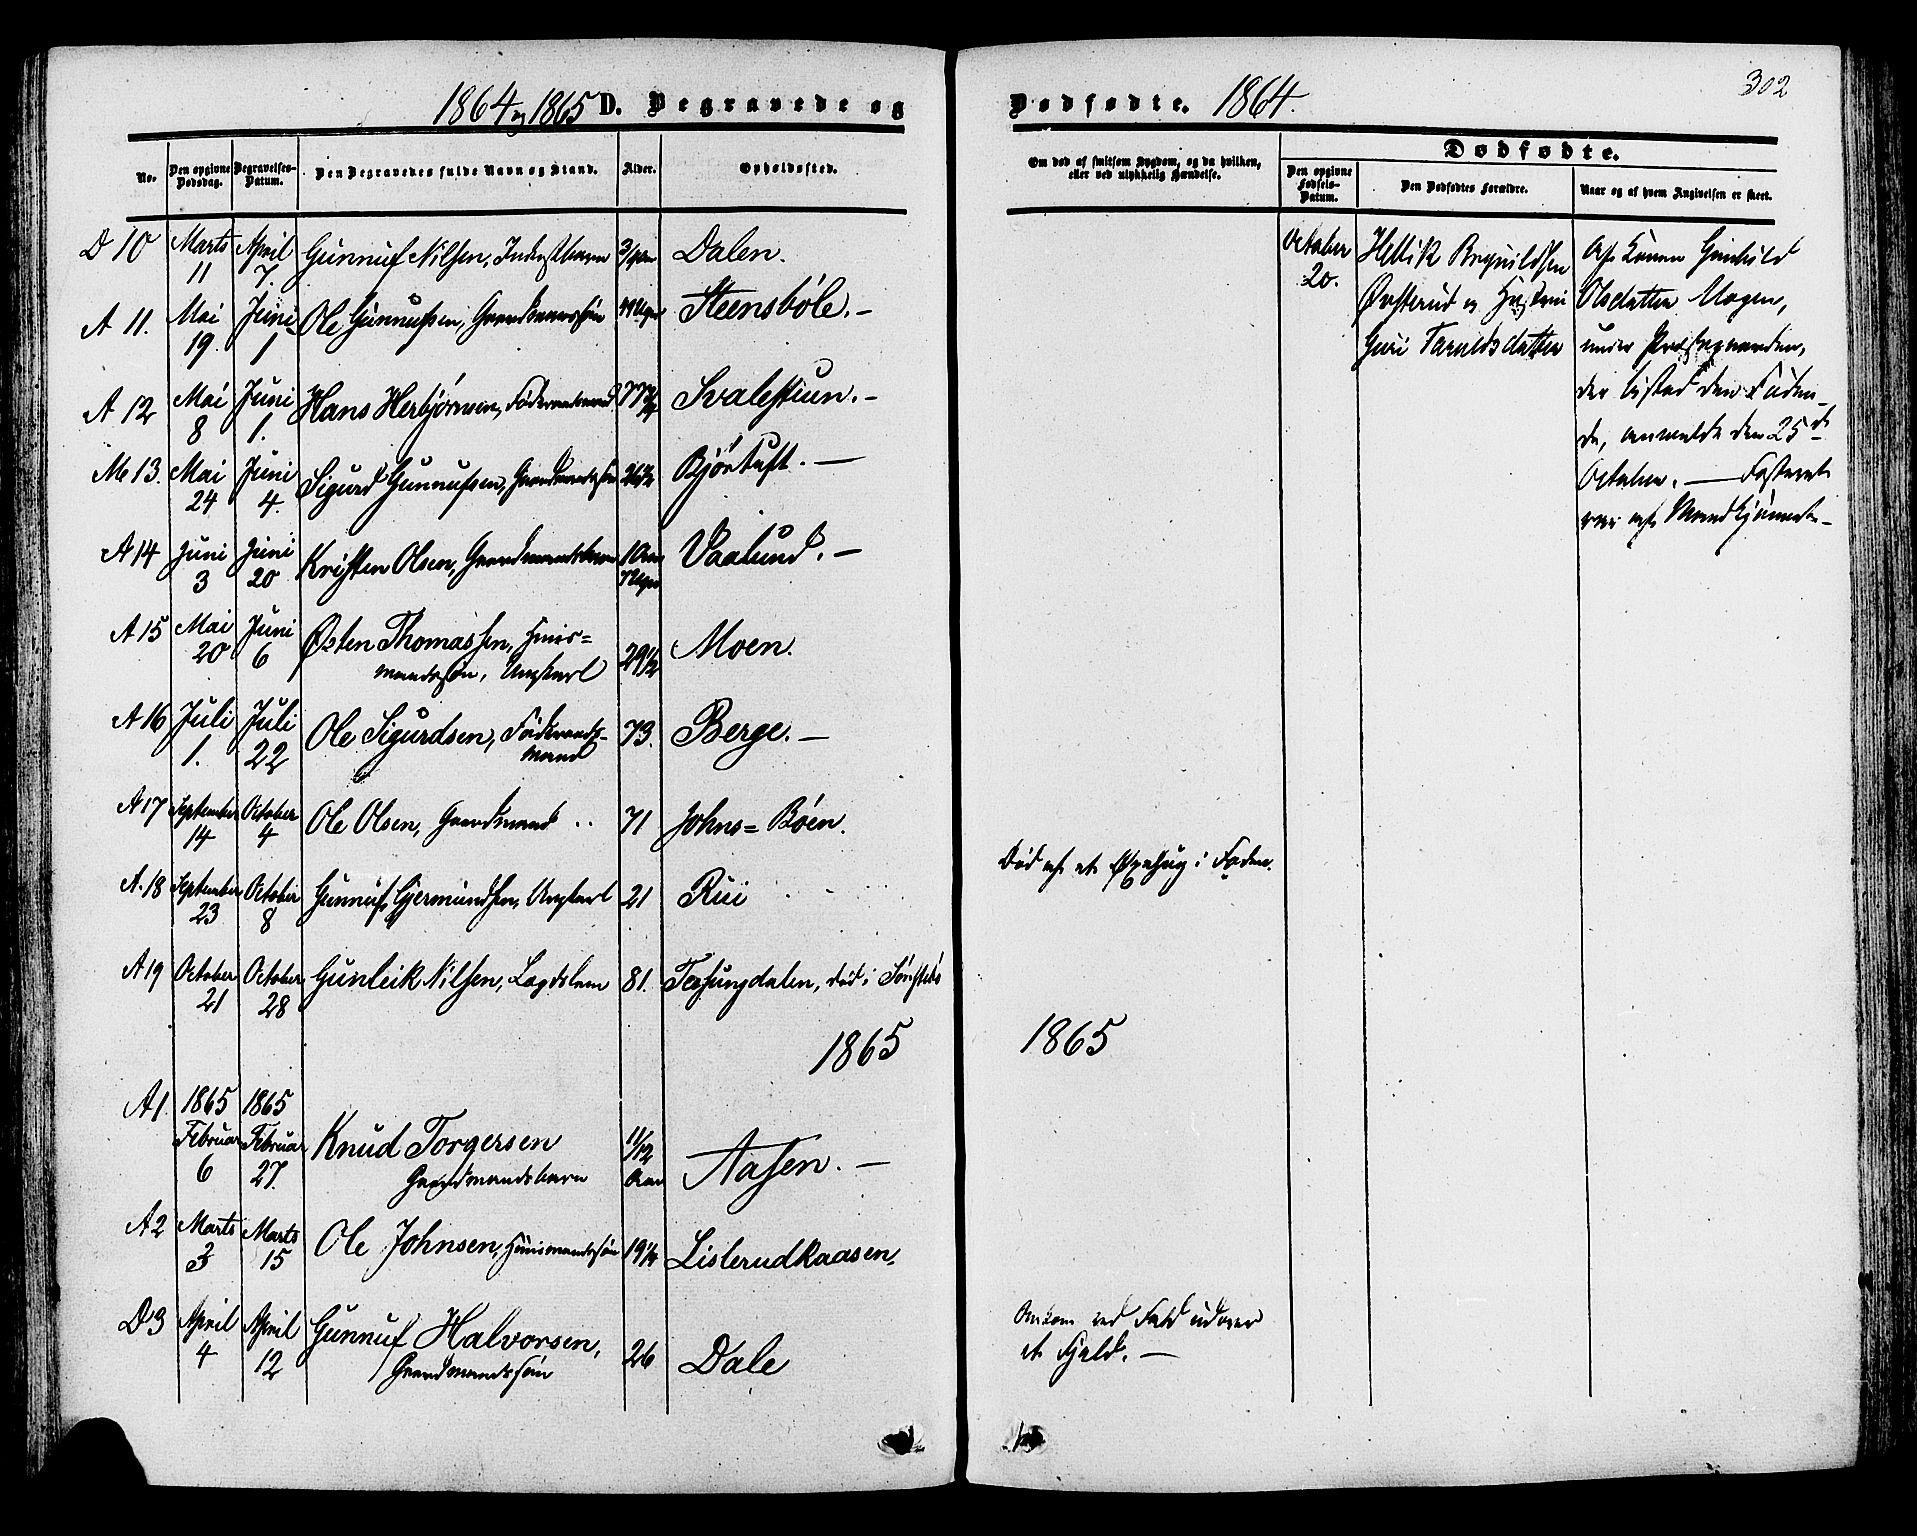 SAKO, Tinn kirkebøker, F/Fa/L0006: Ministerialbok nr. I 6, 1857-1878, s. 302